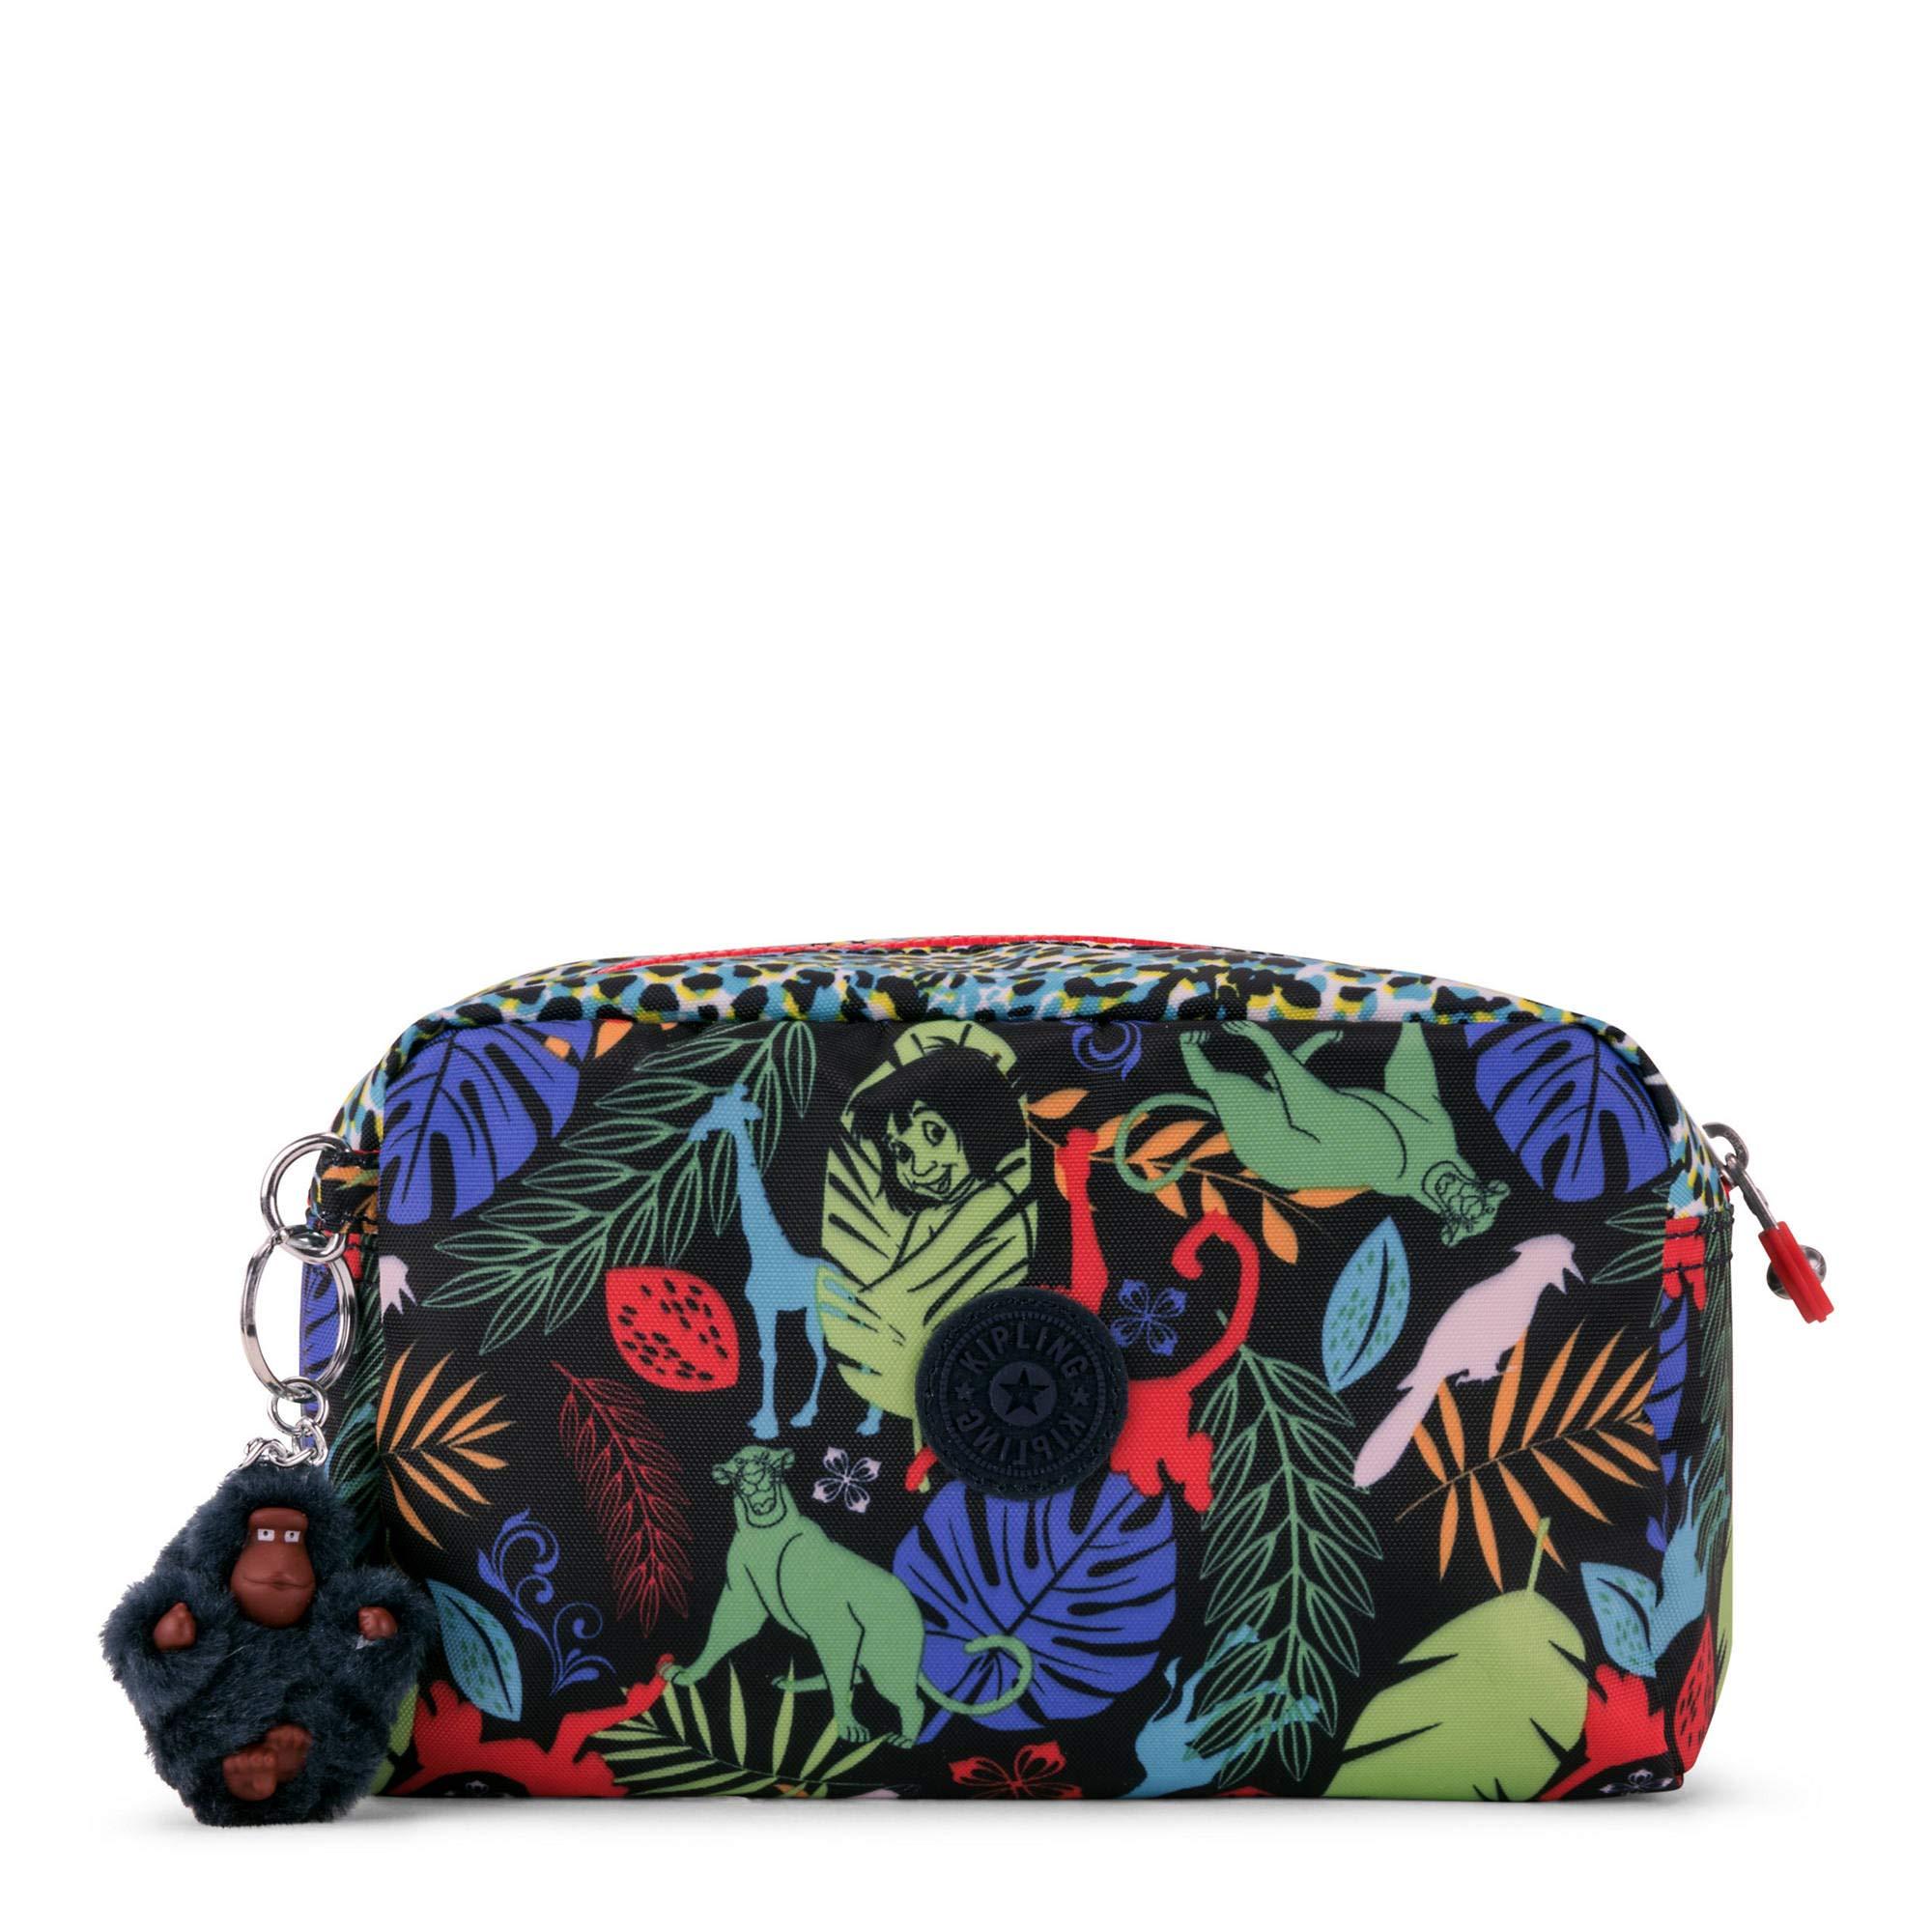 Kipling Disney's Jungle Book Gleam Pouch, Bare Necessities Combo by Kipling